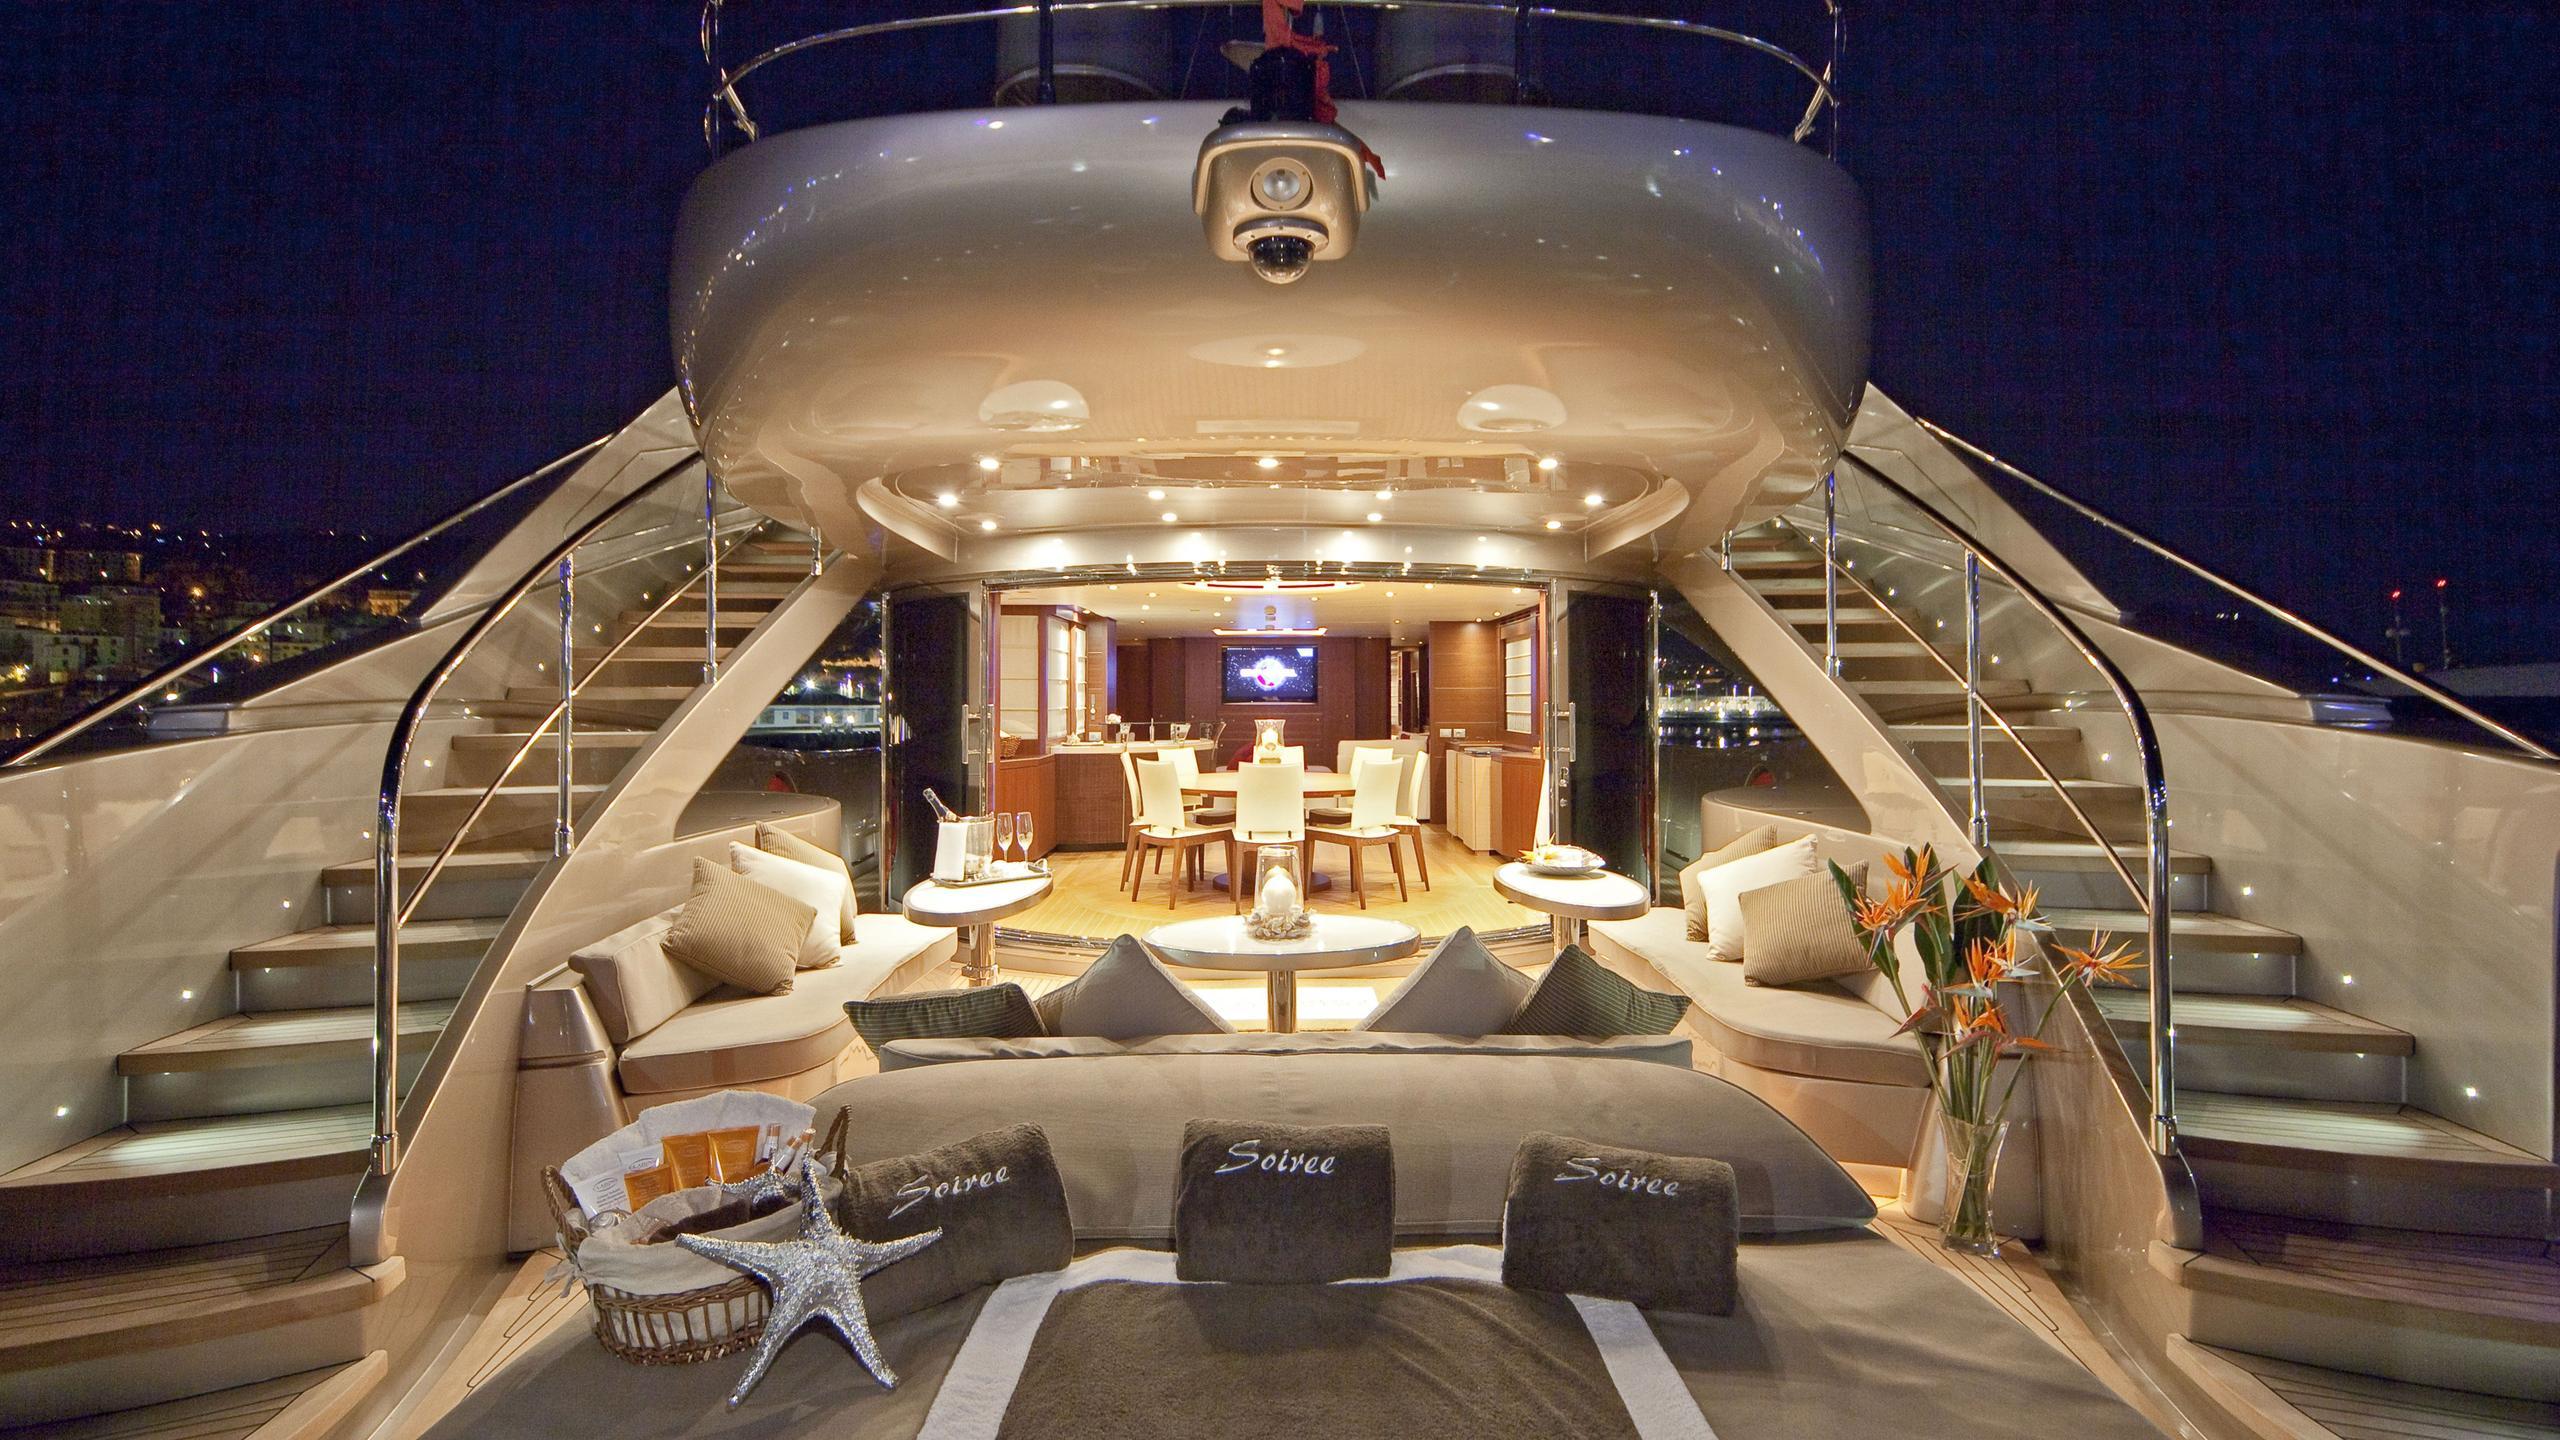 Soiree yacht aft deck